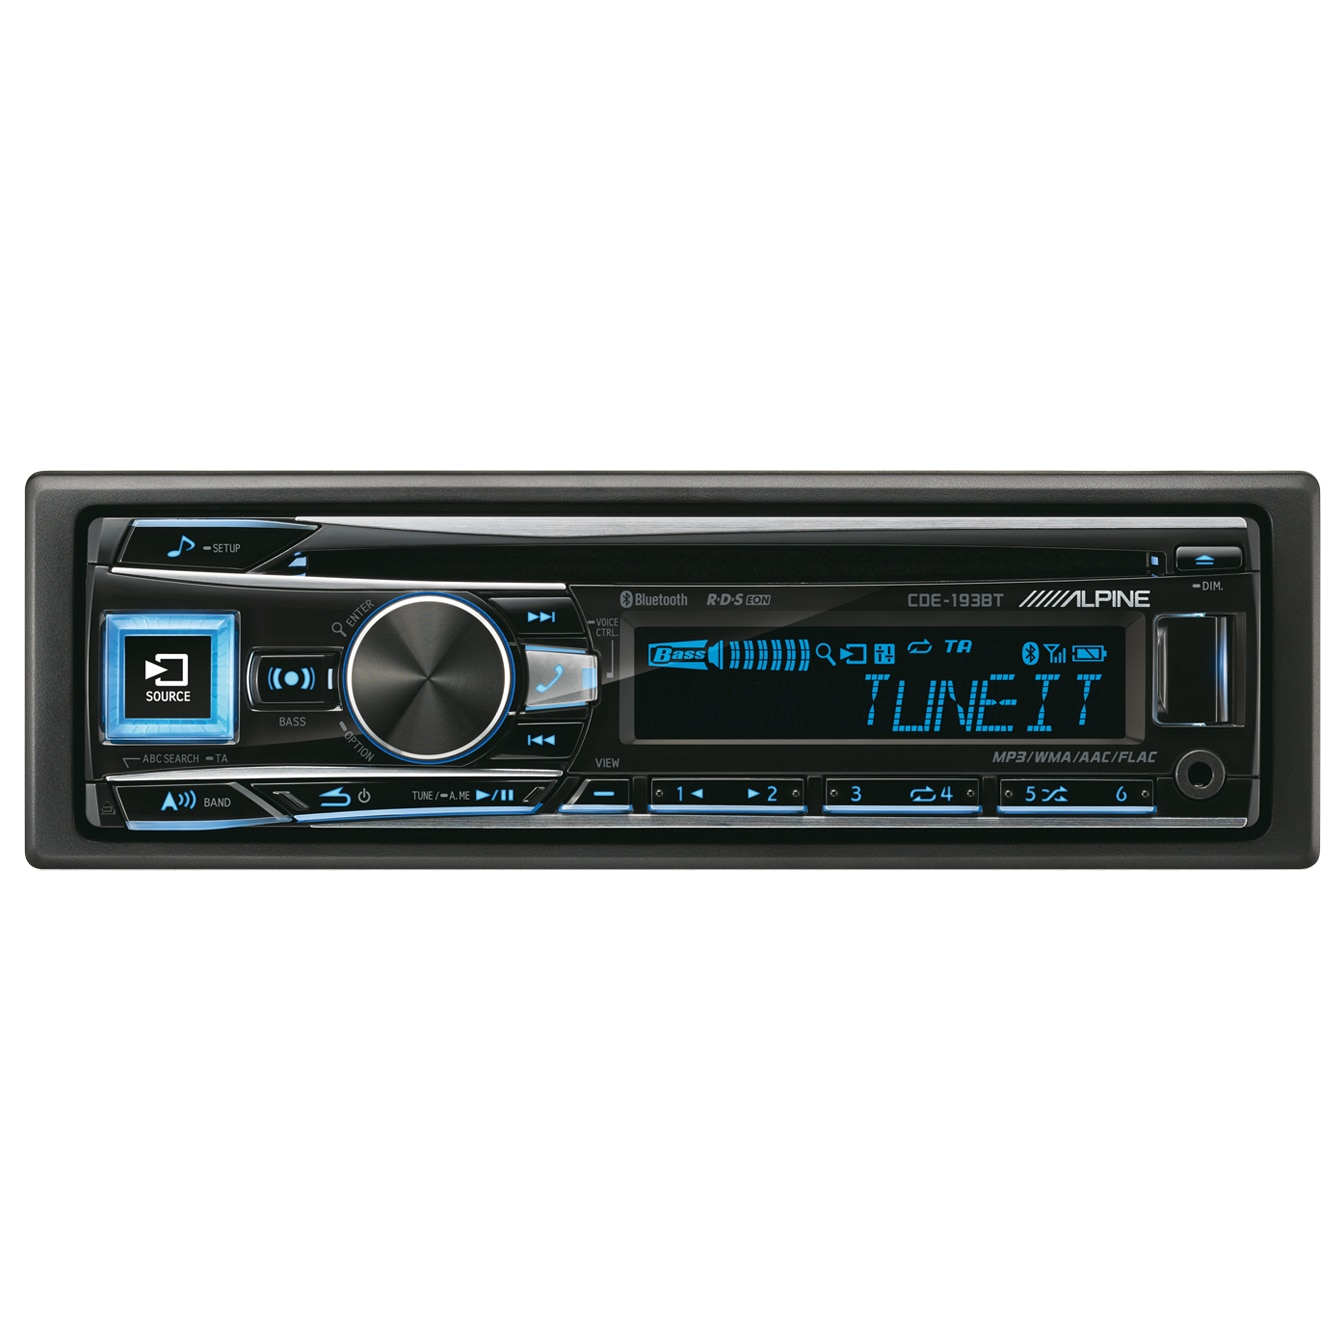 Fotografie Radio CD Alpine CDE-193BT, 4X50W RMS, Bluetooth, USB, AUX, iluminare taste variabila